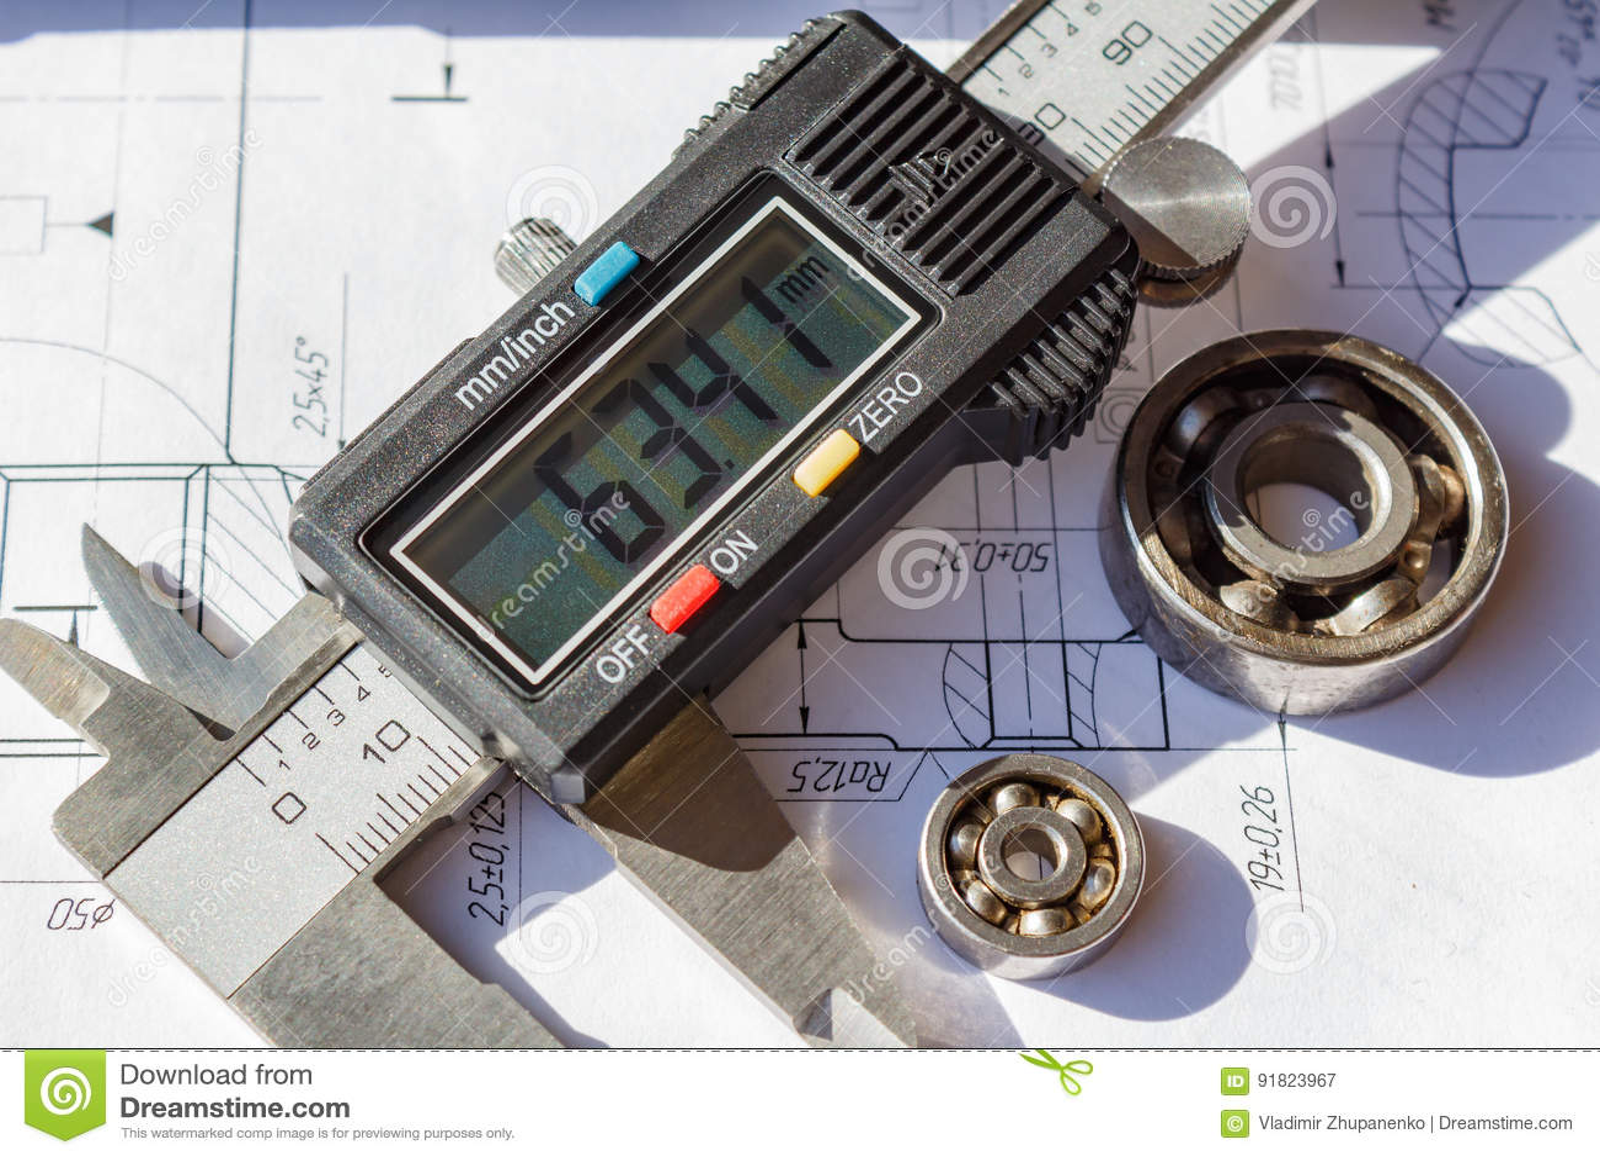 Electronic caliper and used ball bearings closeup